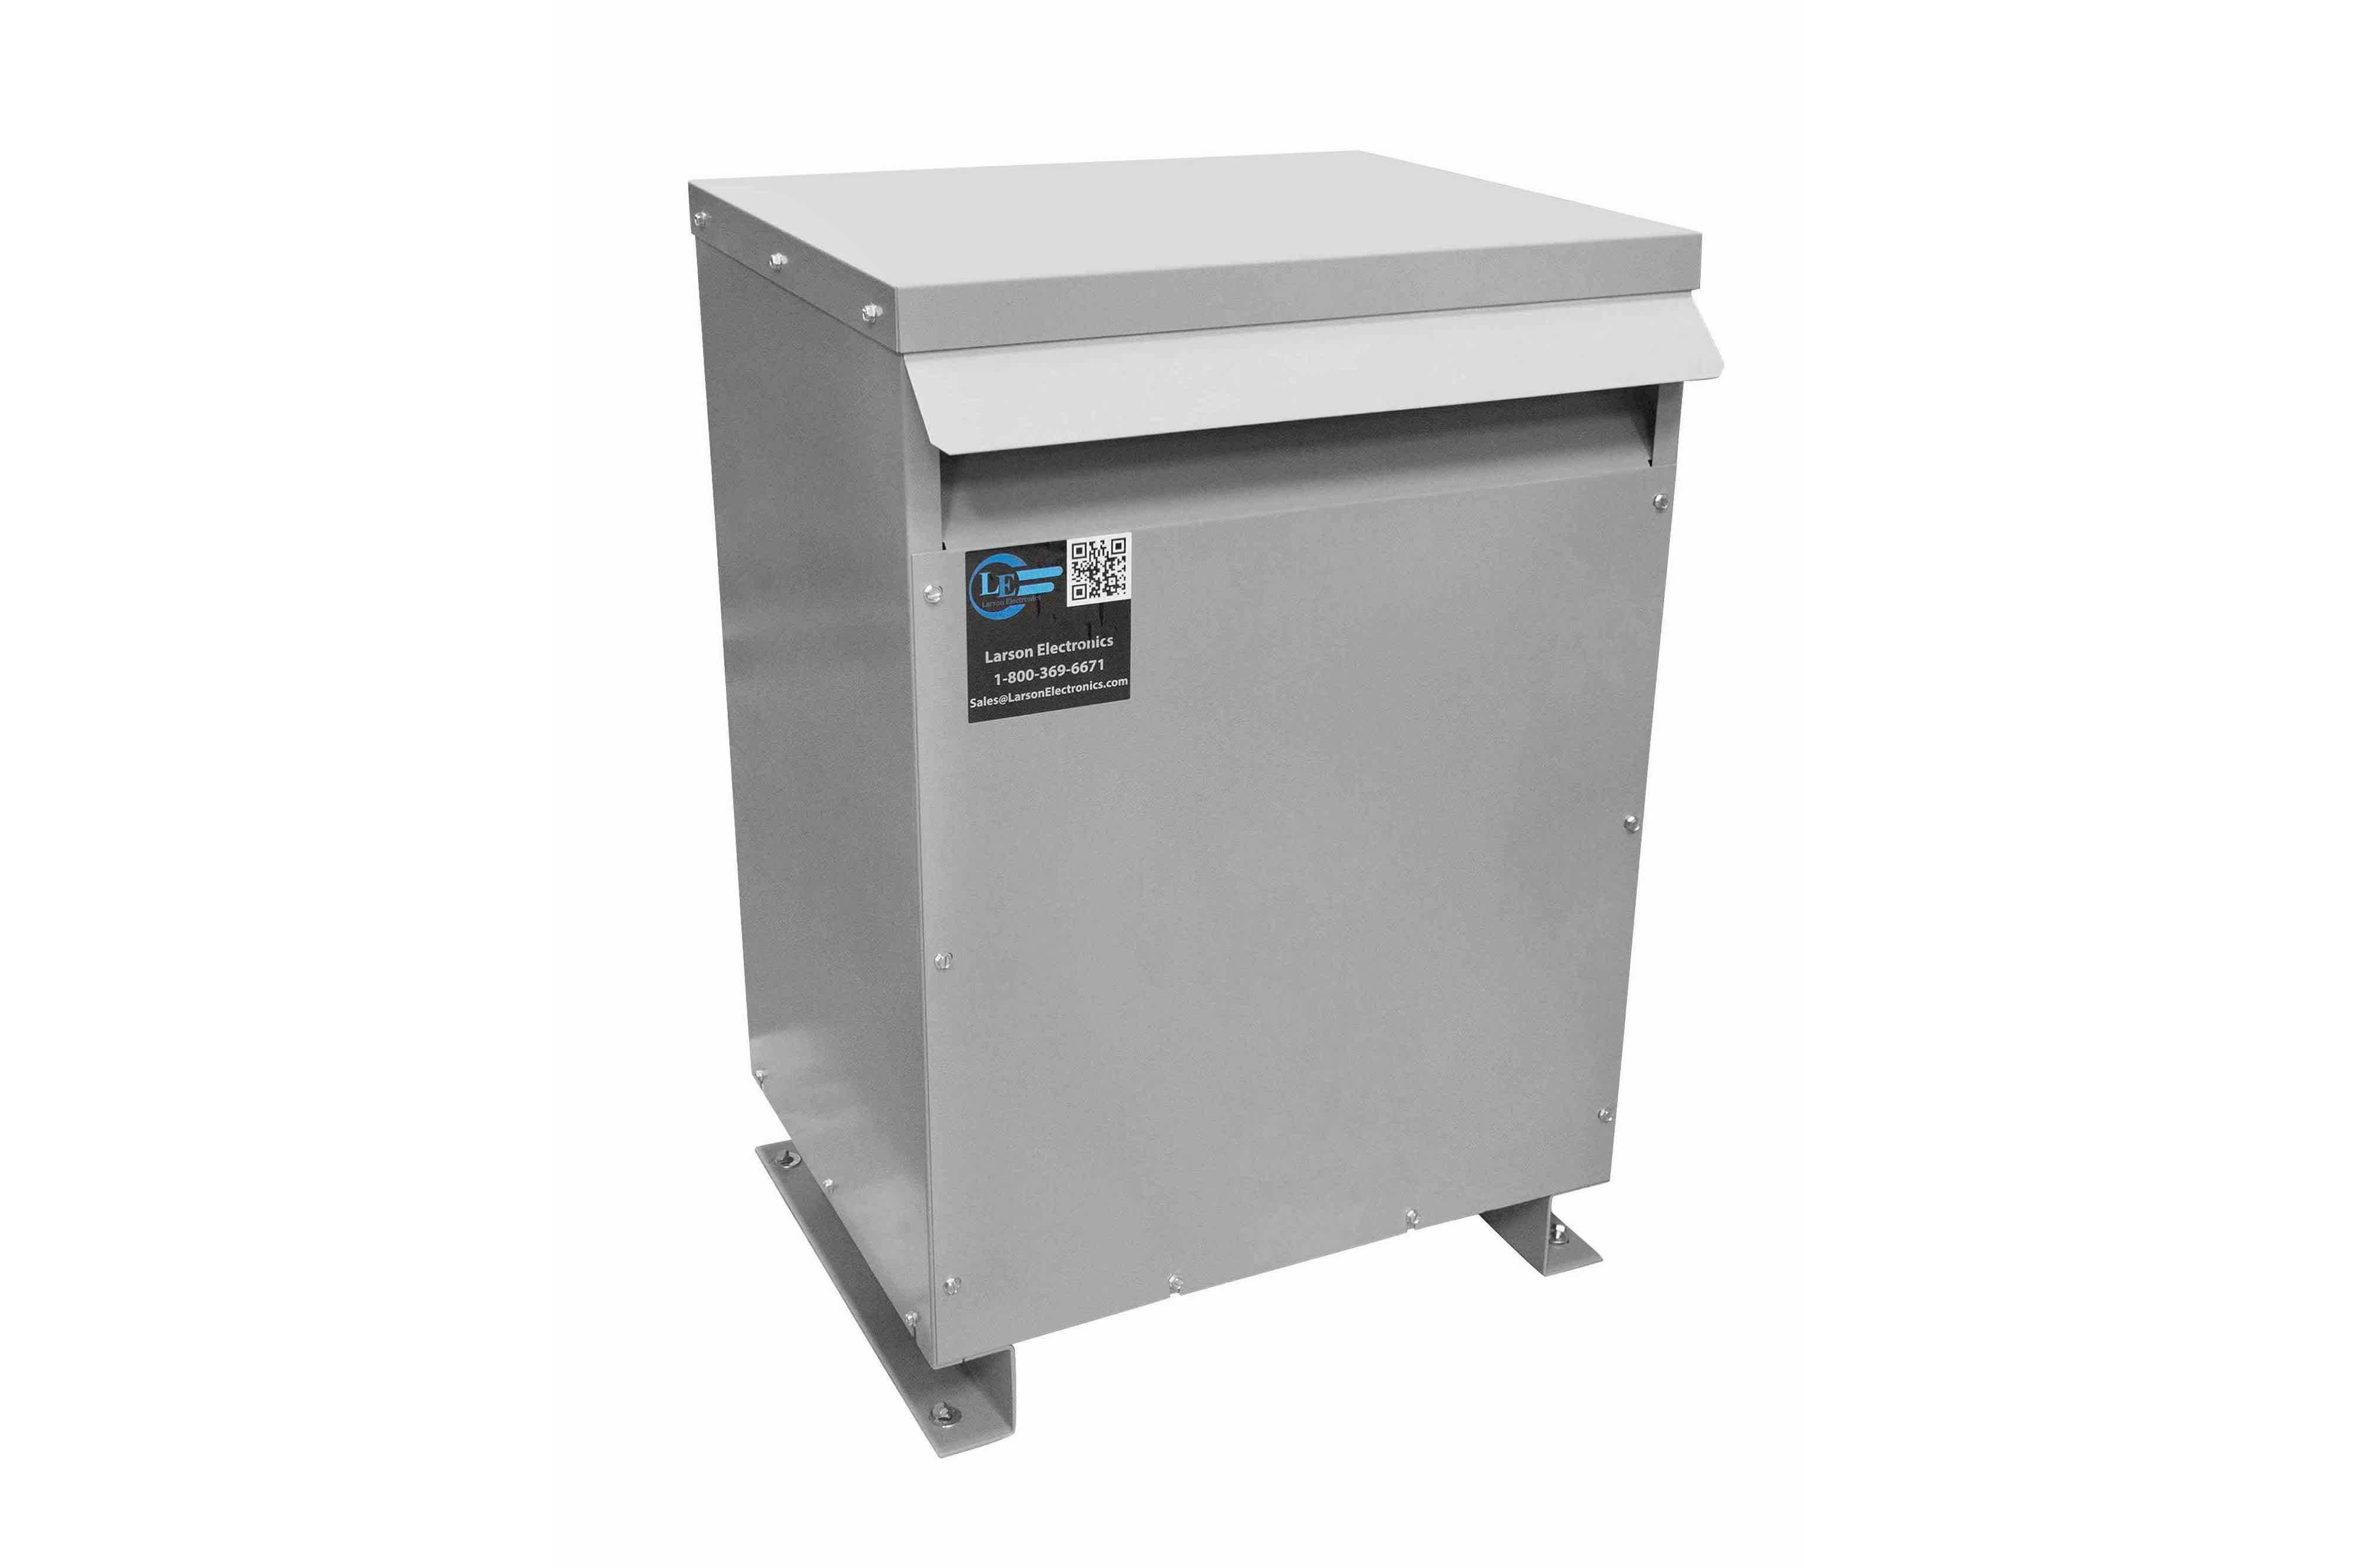 150 kVA 3PH Isolation Transformer, 208V Wye Primary, 480Y/277 Wye-N Secondary, N3R, Ventilated, 60 Hz